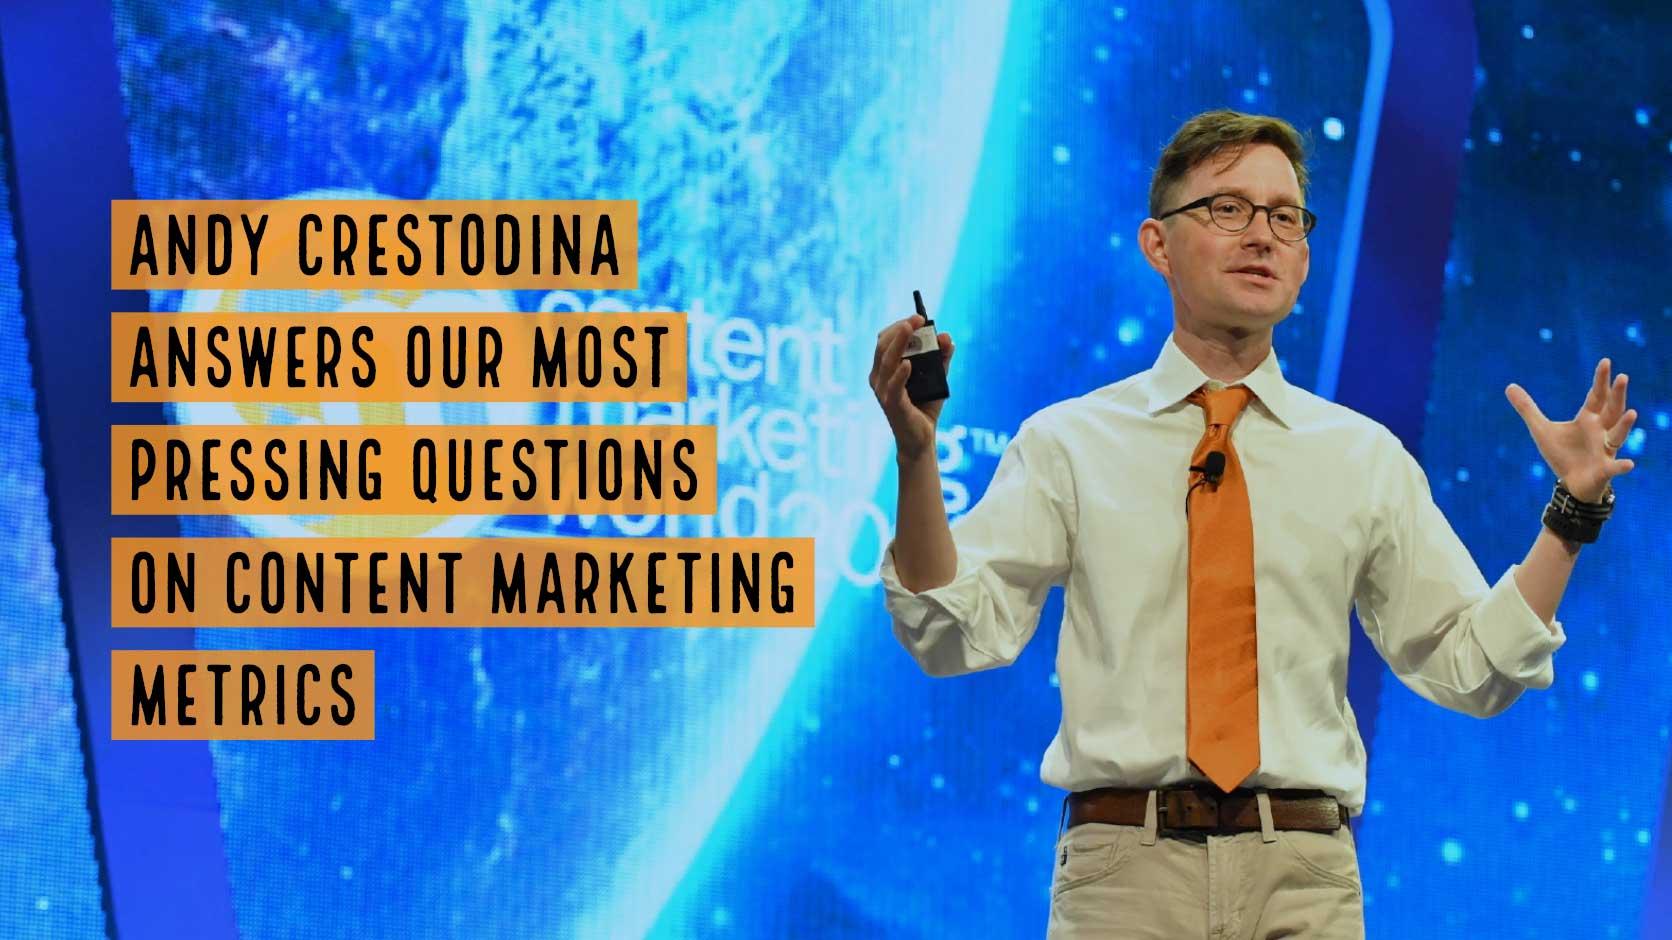 Andy Crestodina Dishes Expertise on Content Marketing Metrics